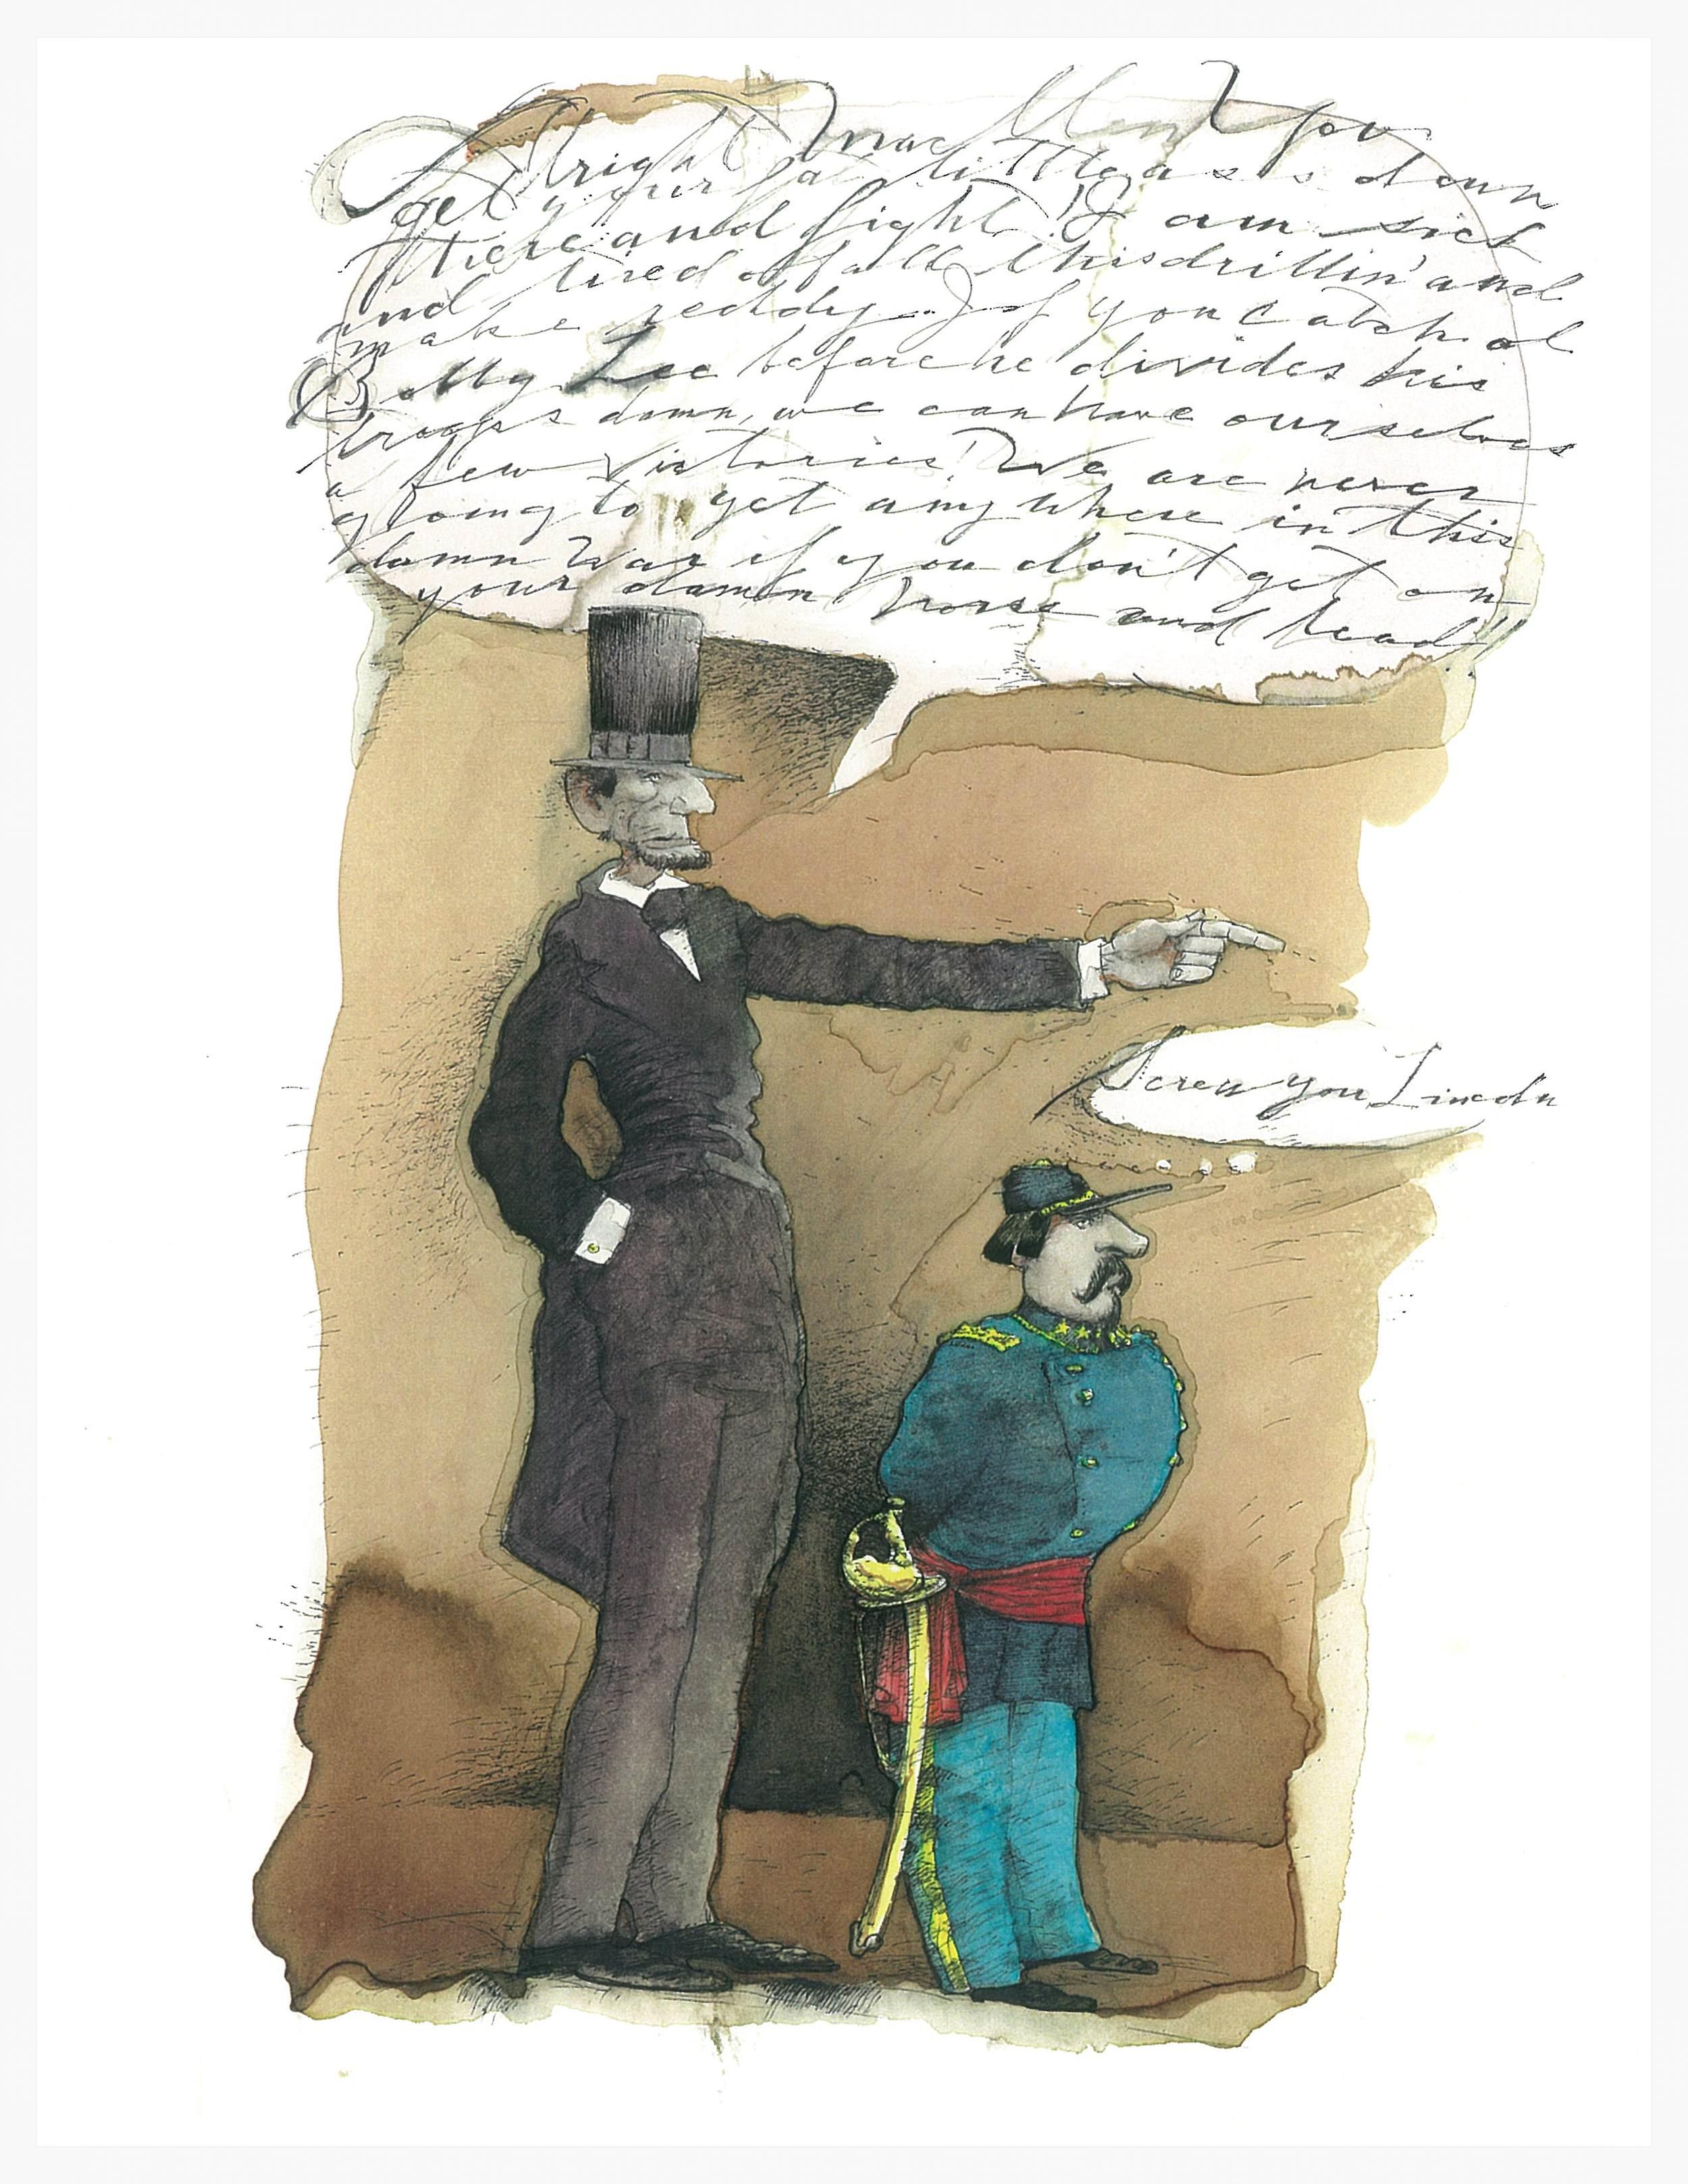 Lincoln & McLellan